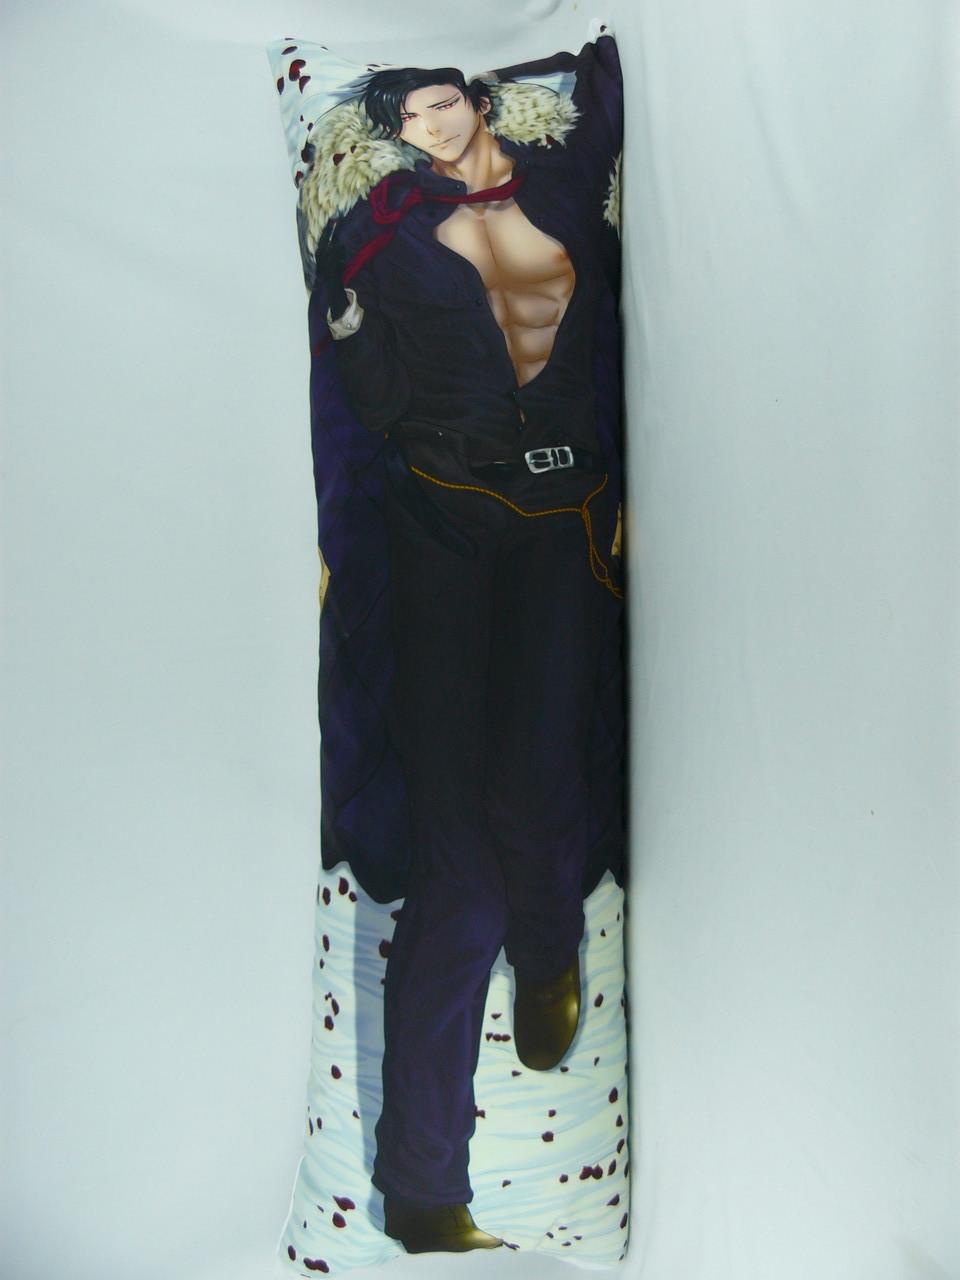 Подушка обнимашка Дакимакура  150 х 50 Люцифер для обнимания аниме со съёмной наволочкой односторонняя